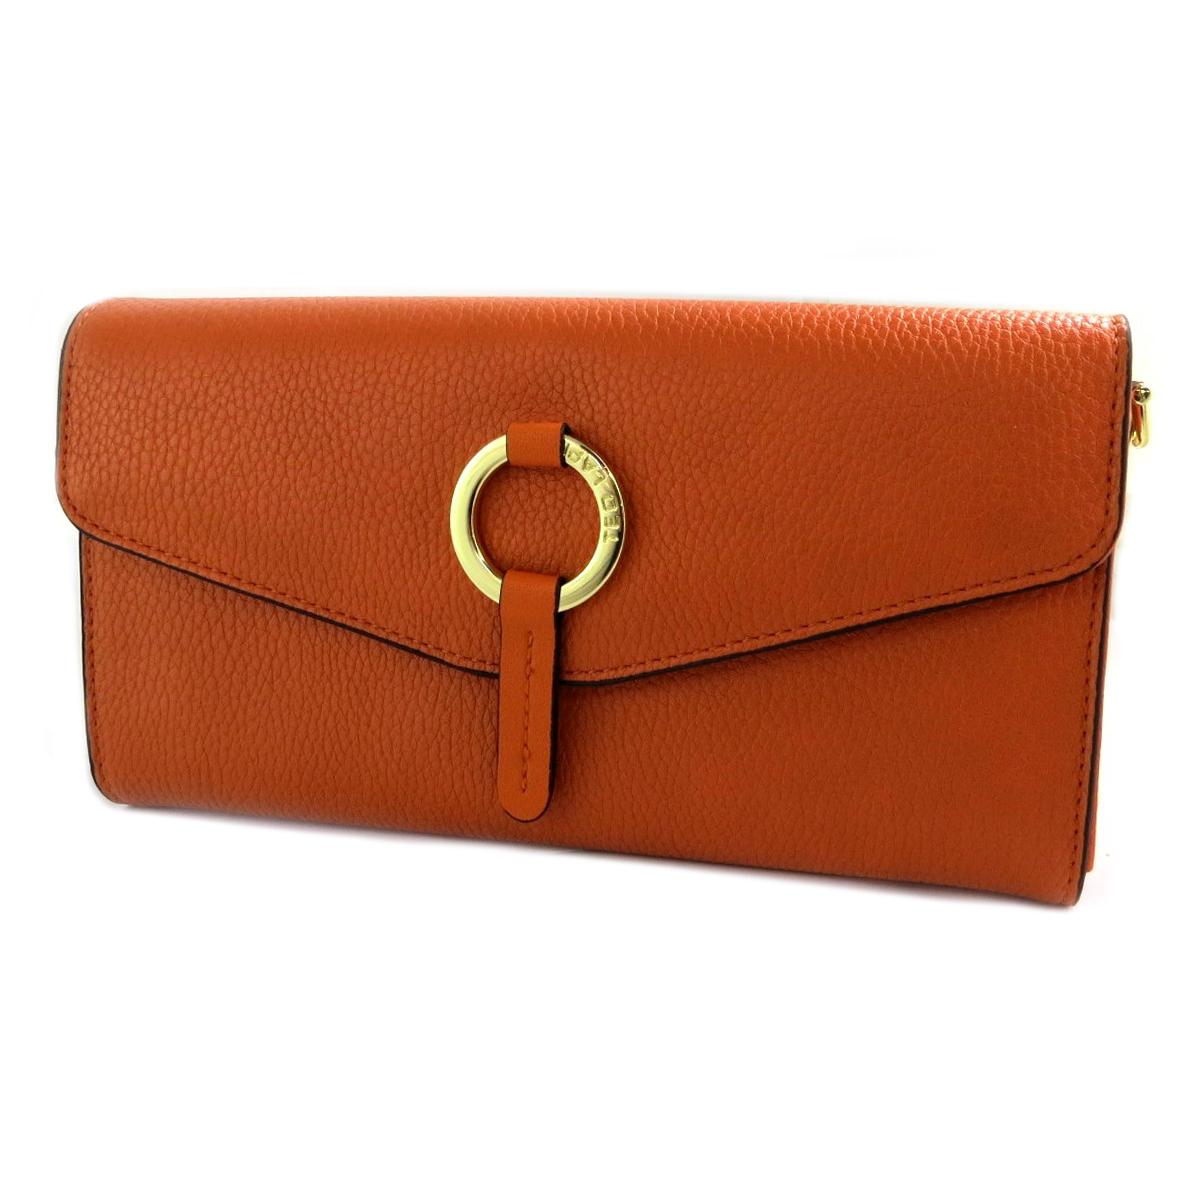 Compagnon Pochette \'Ted Lapidus\' orange (2 compartiments) - 21x12x25 cm - [Q3461]